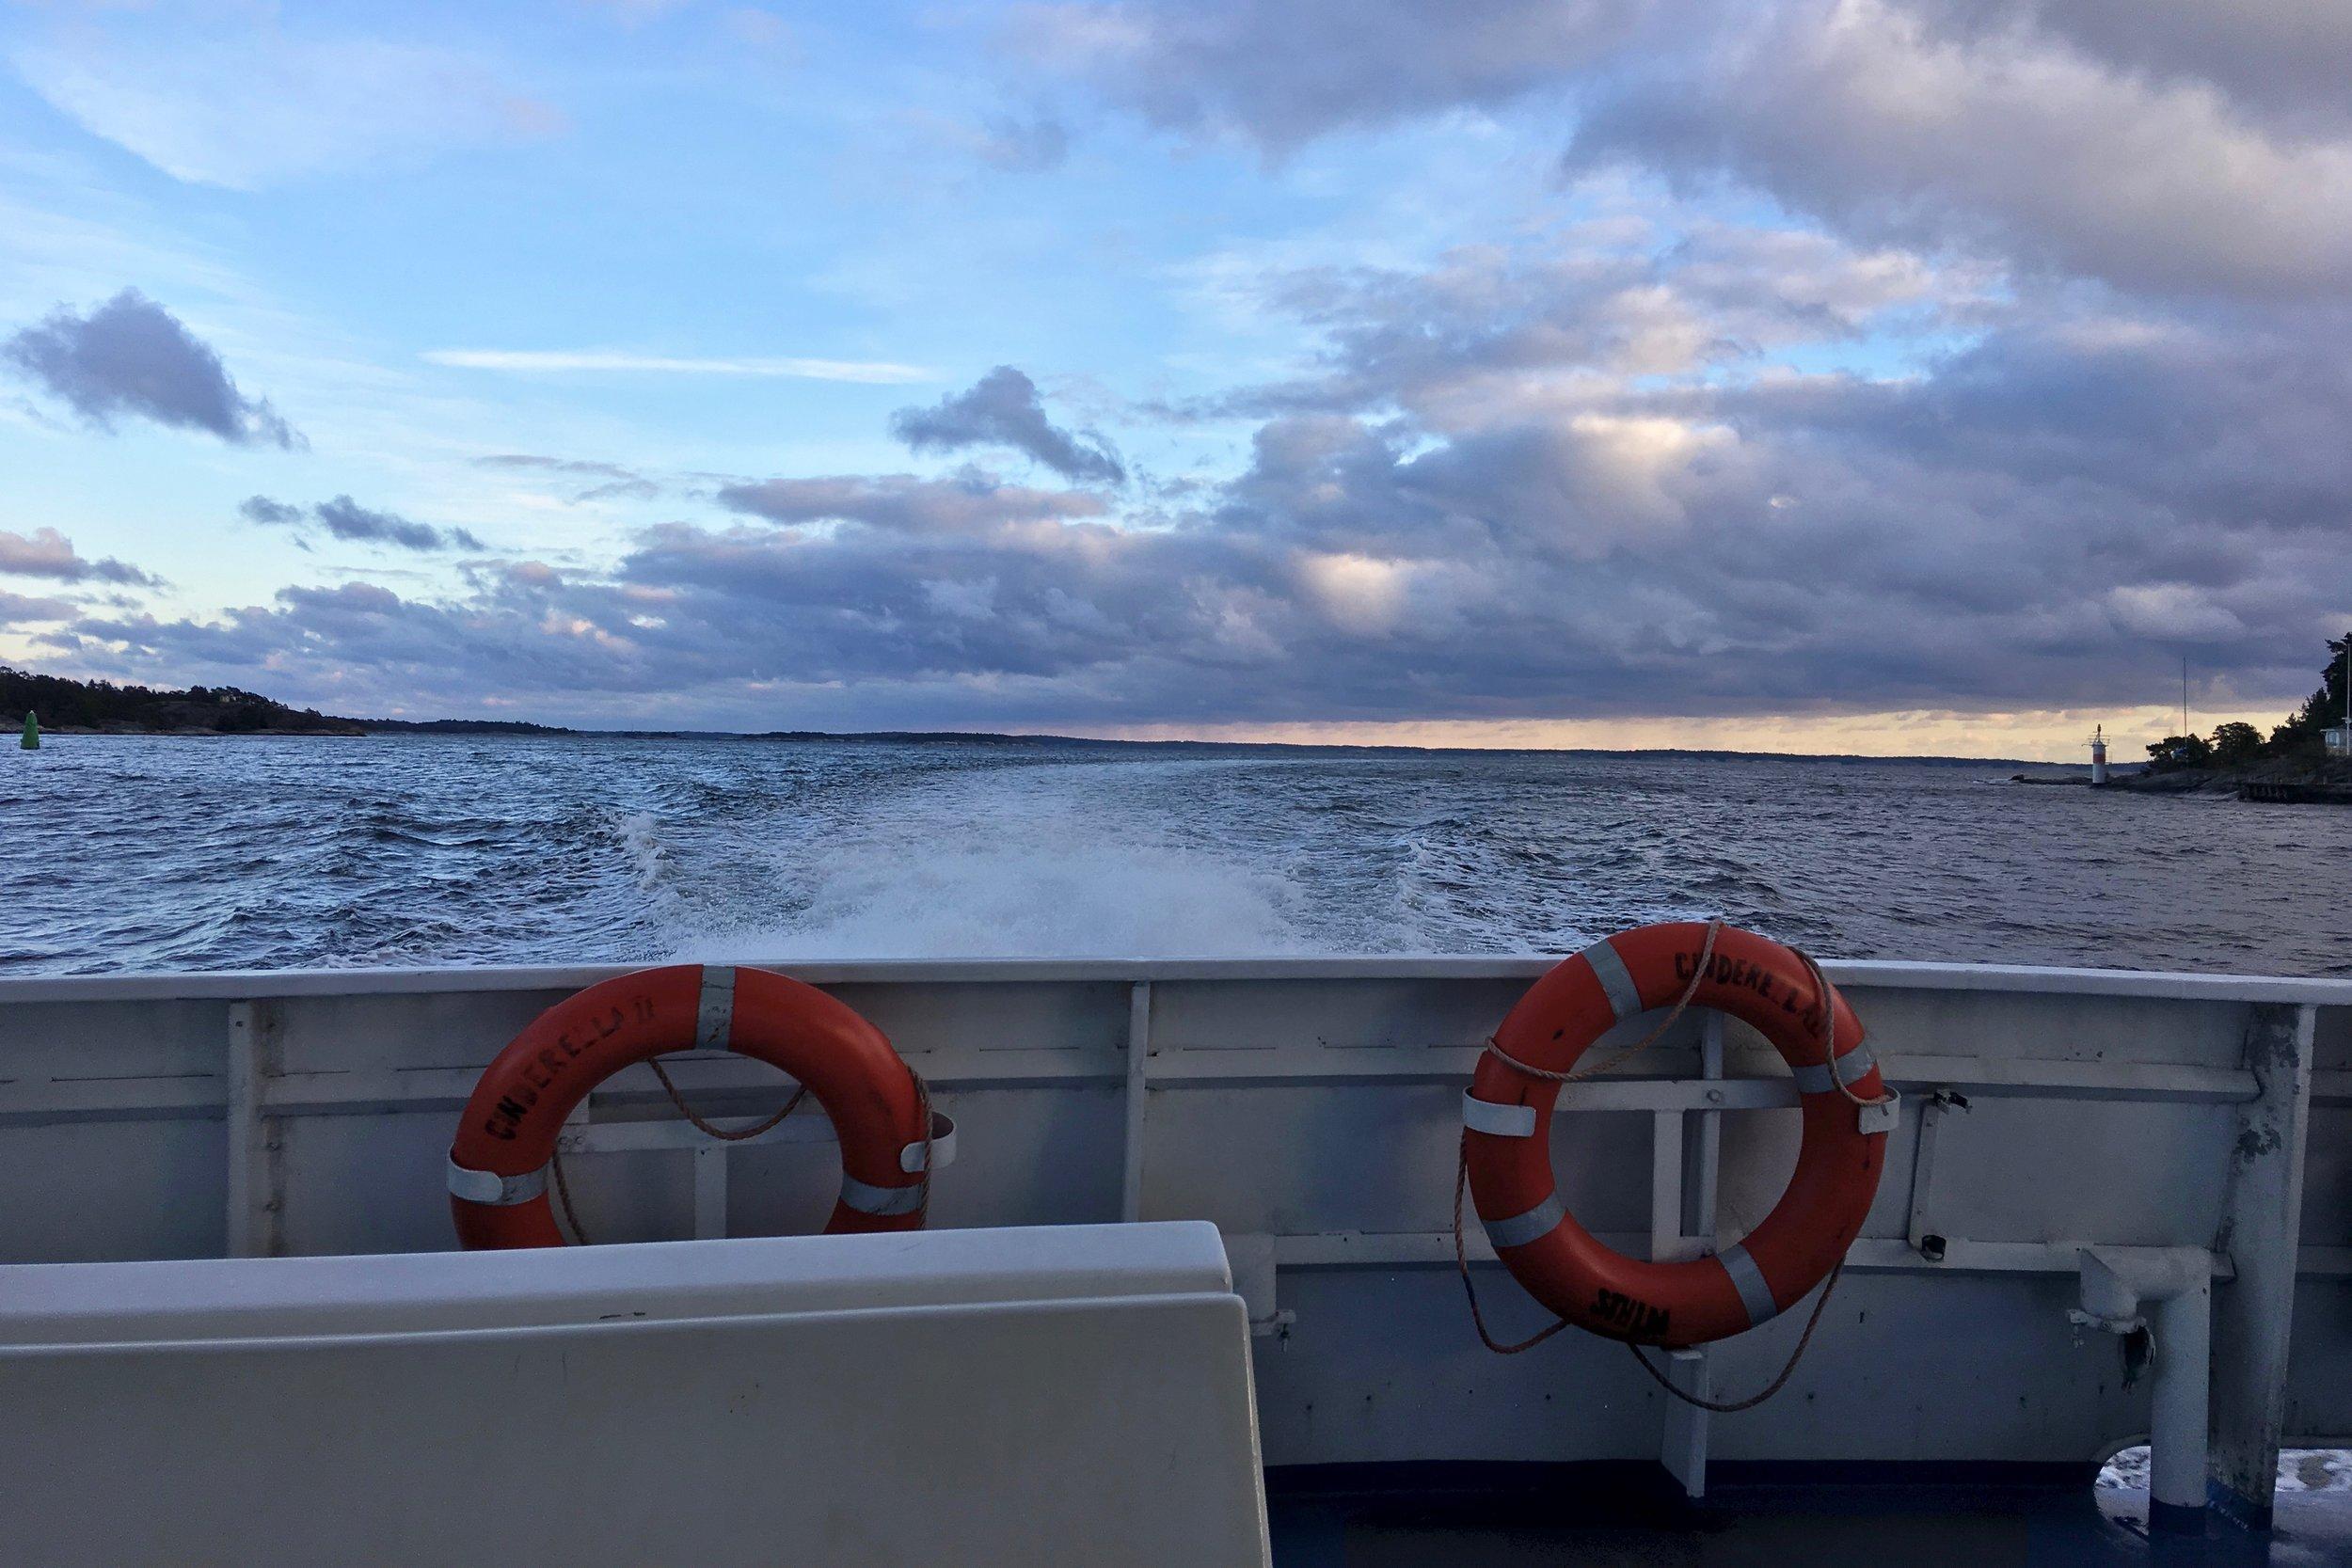 Waxholmsbolaget Ferry    photo by L.D. Van Cleave